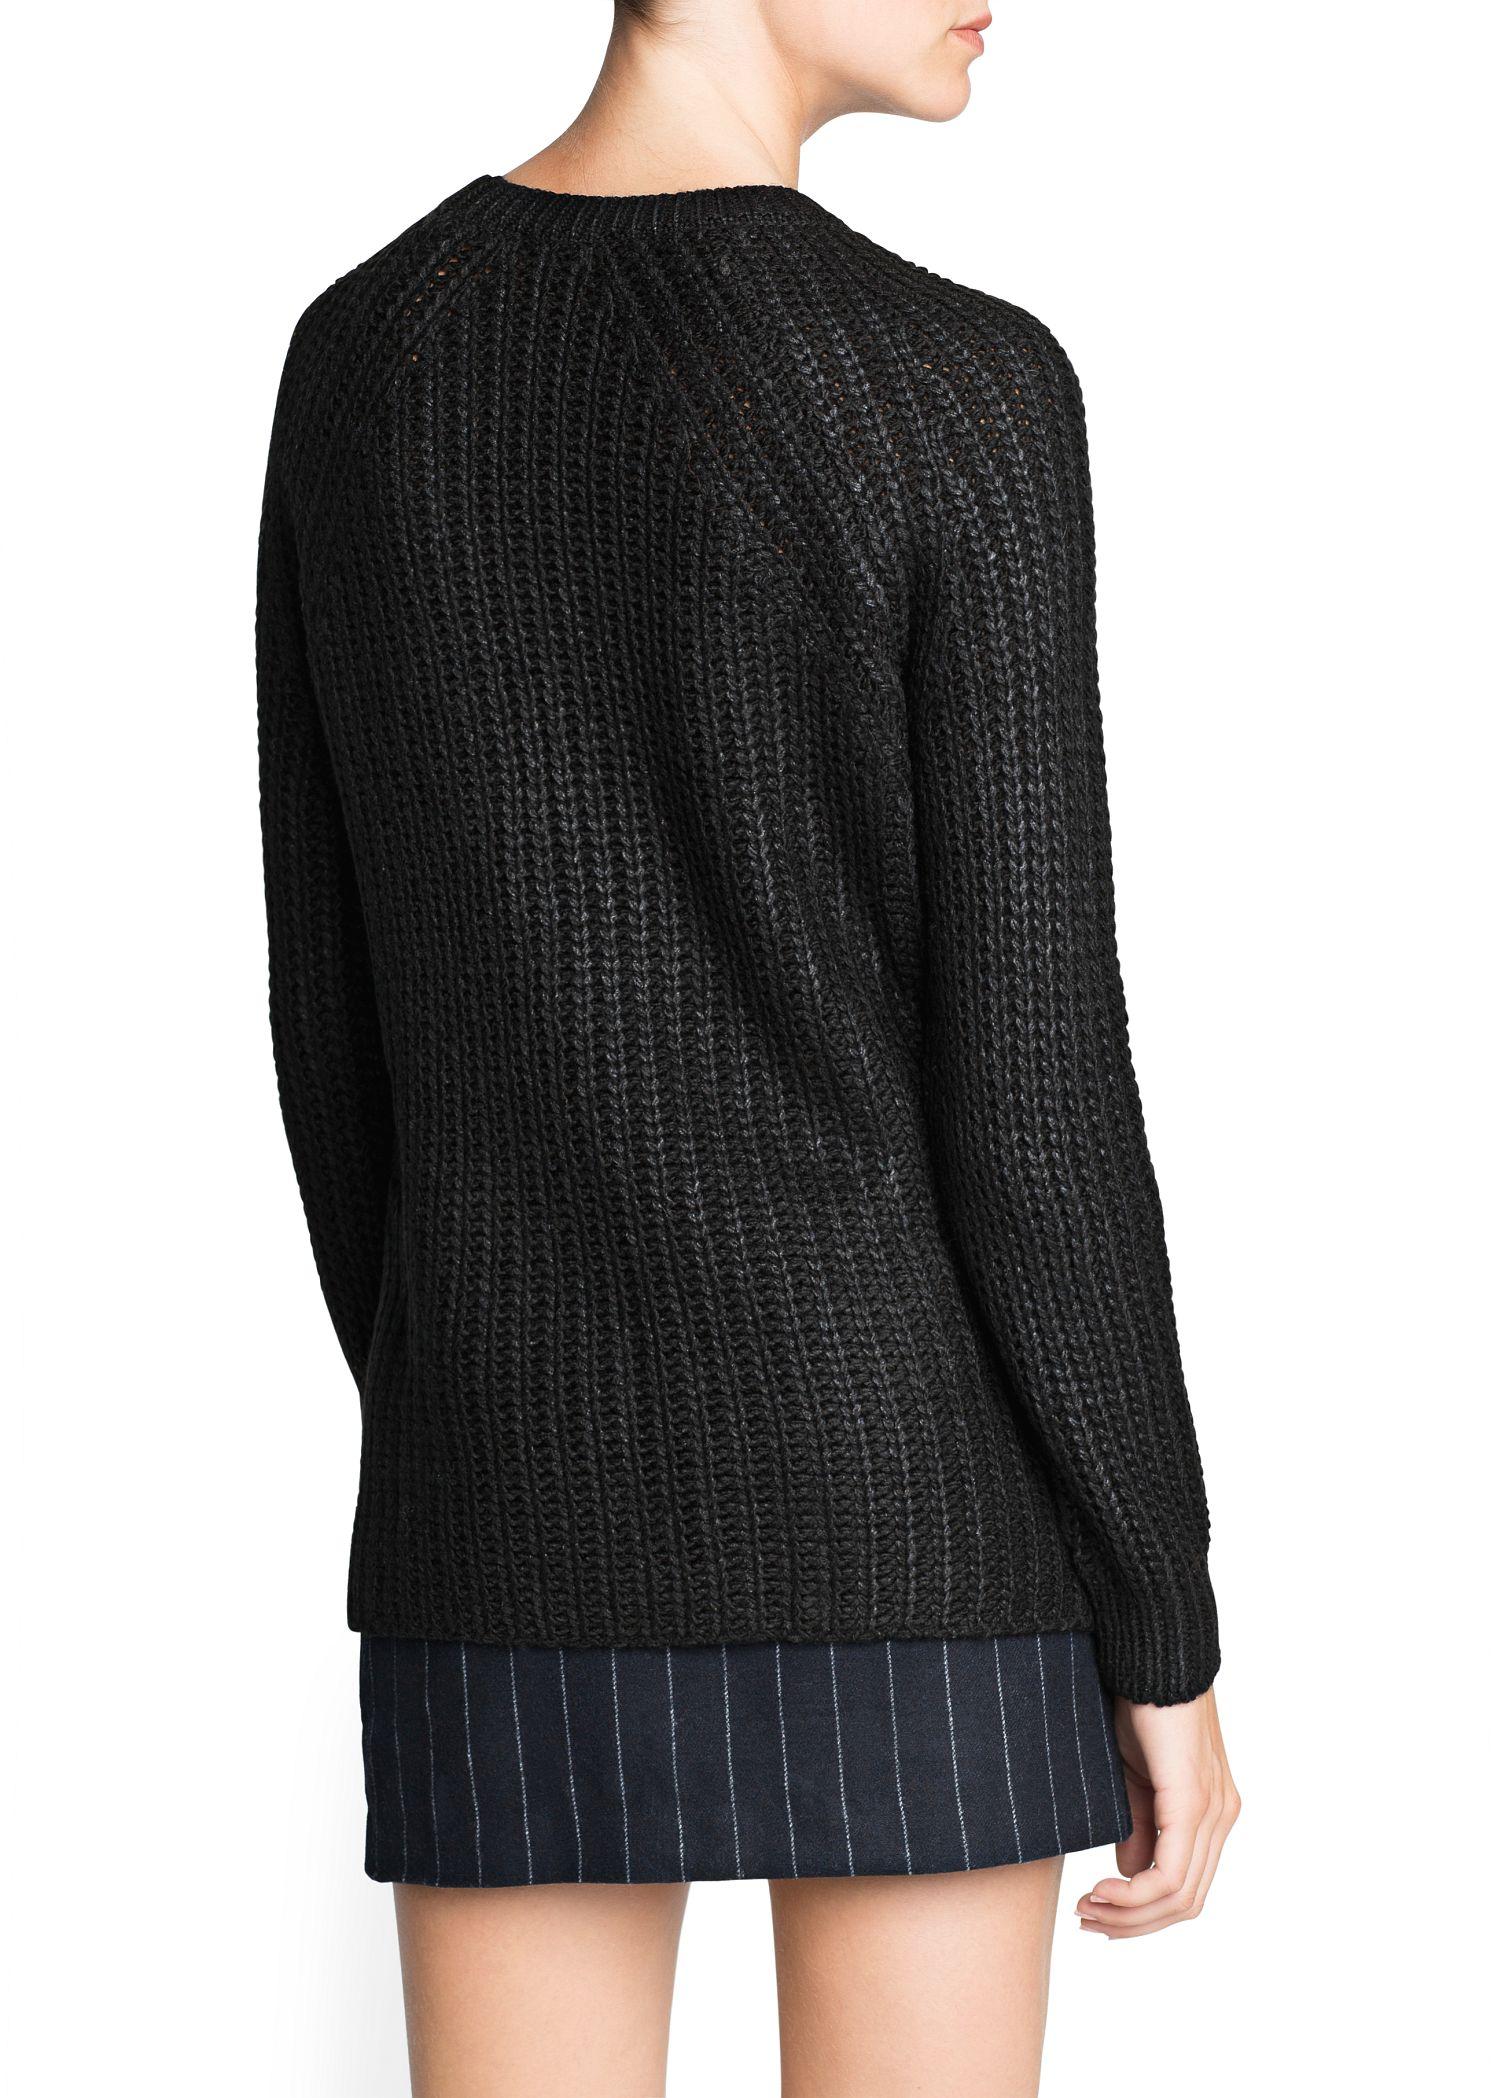 Mango Zip Chunky Knit Sweater in Black | Lyst